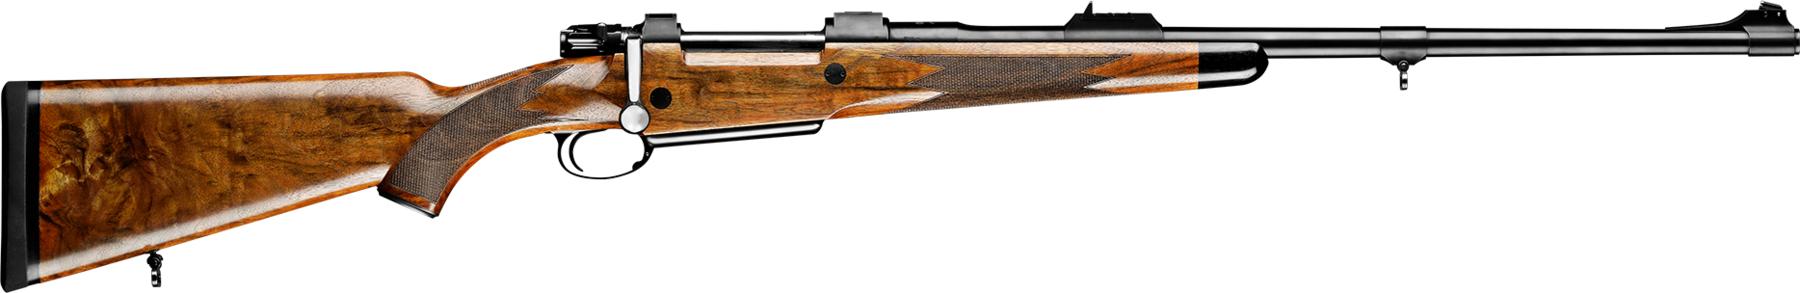 Mauser M98 Magnum rifle